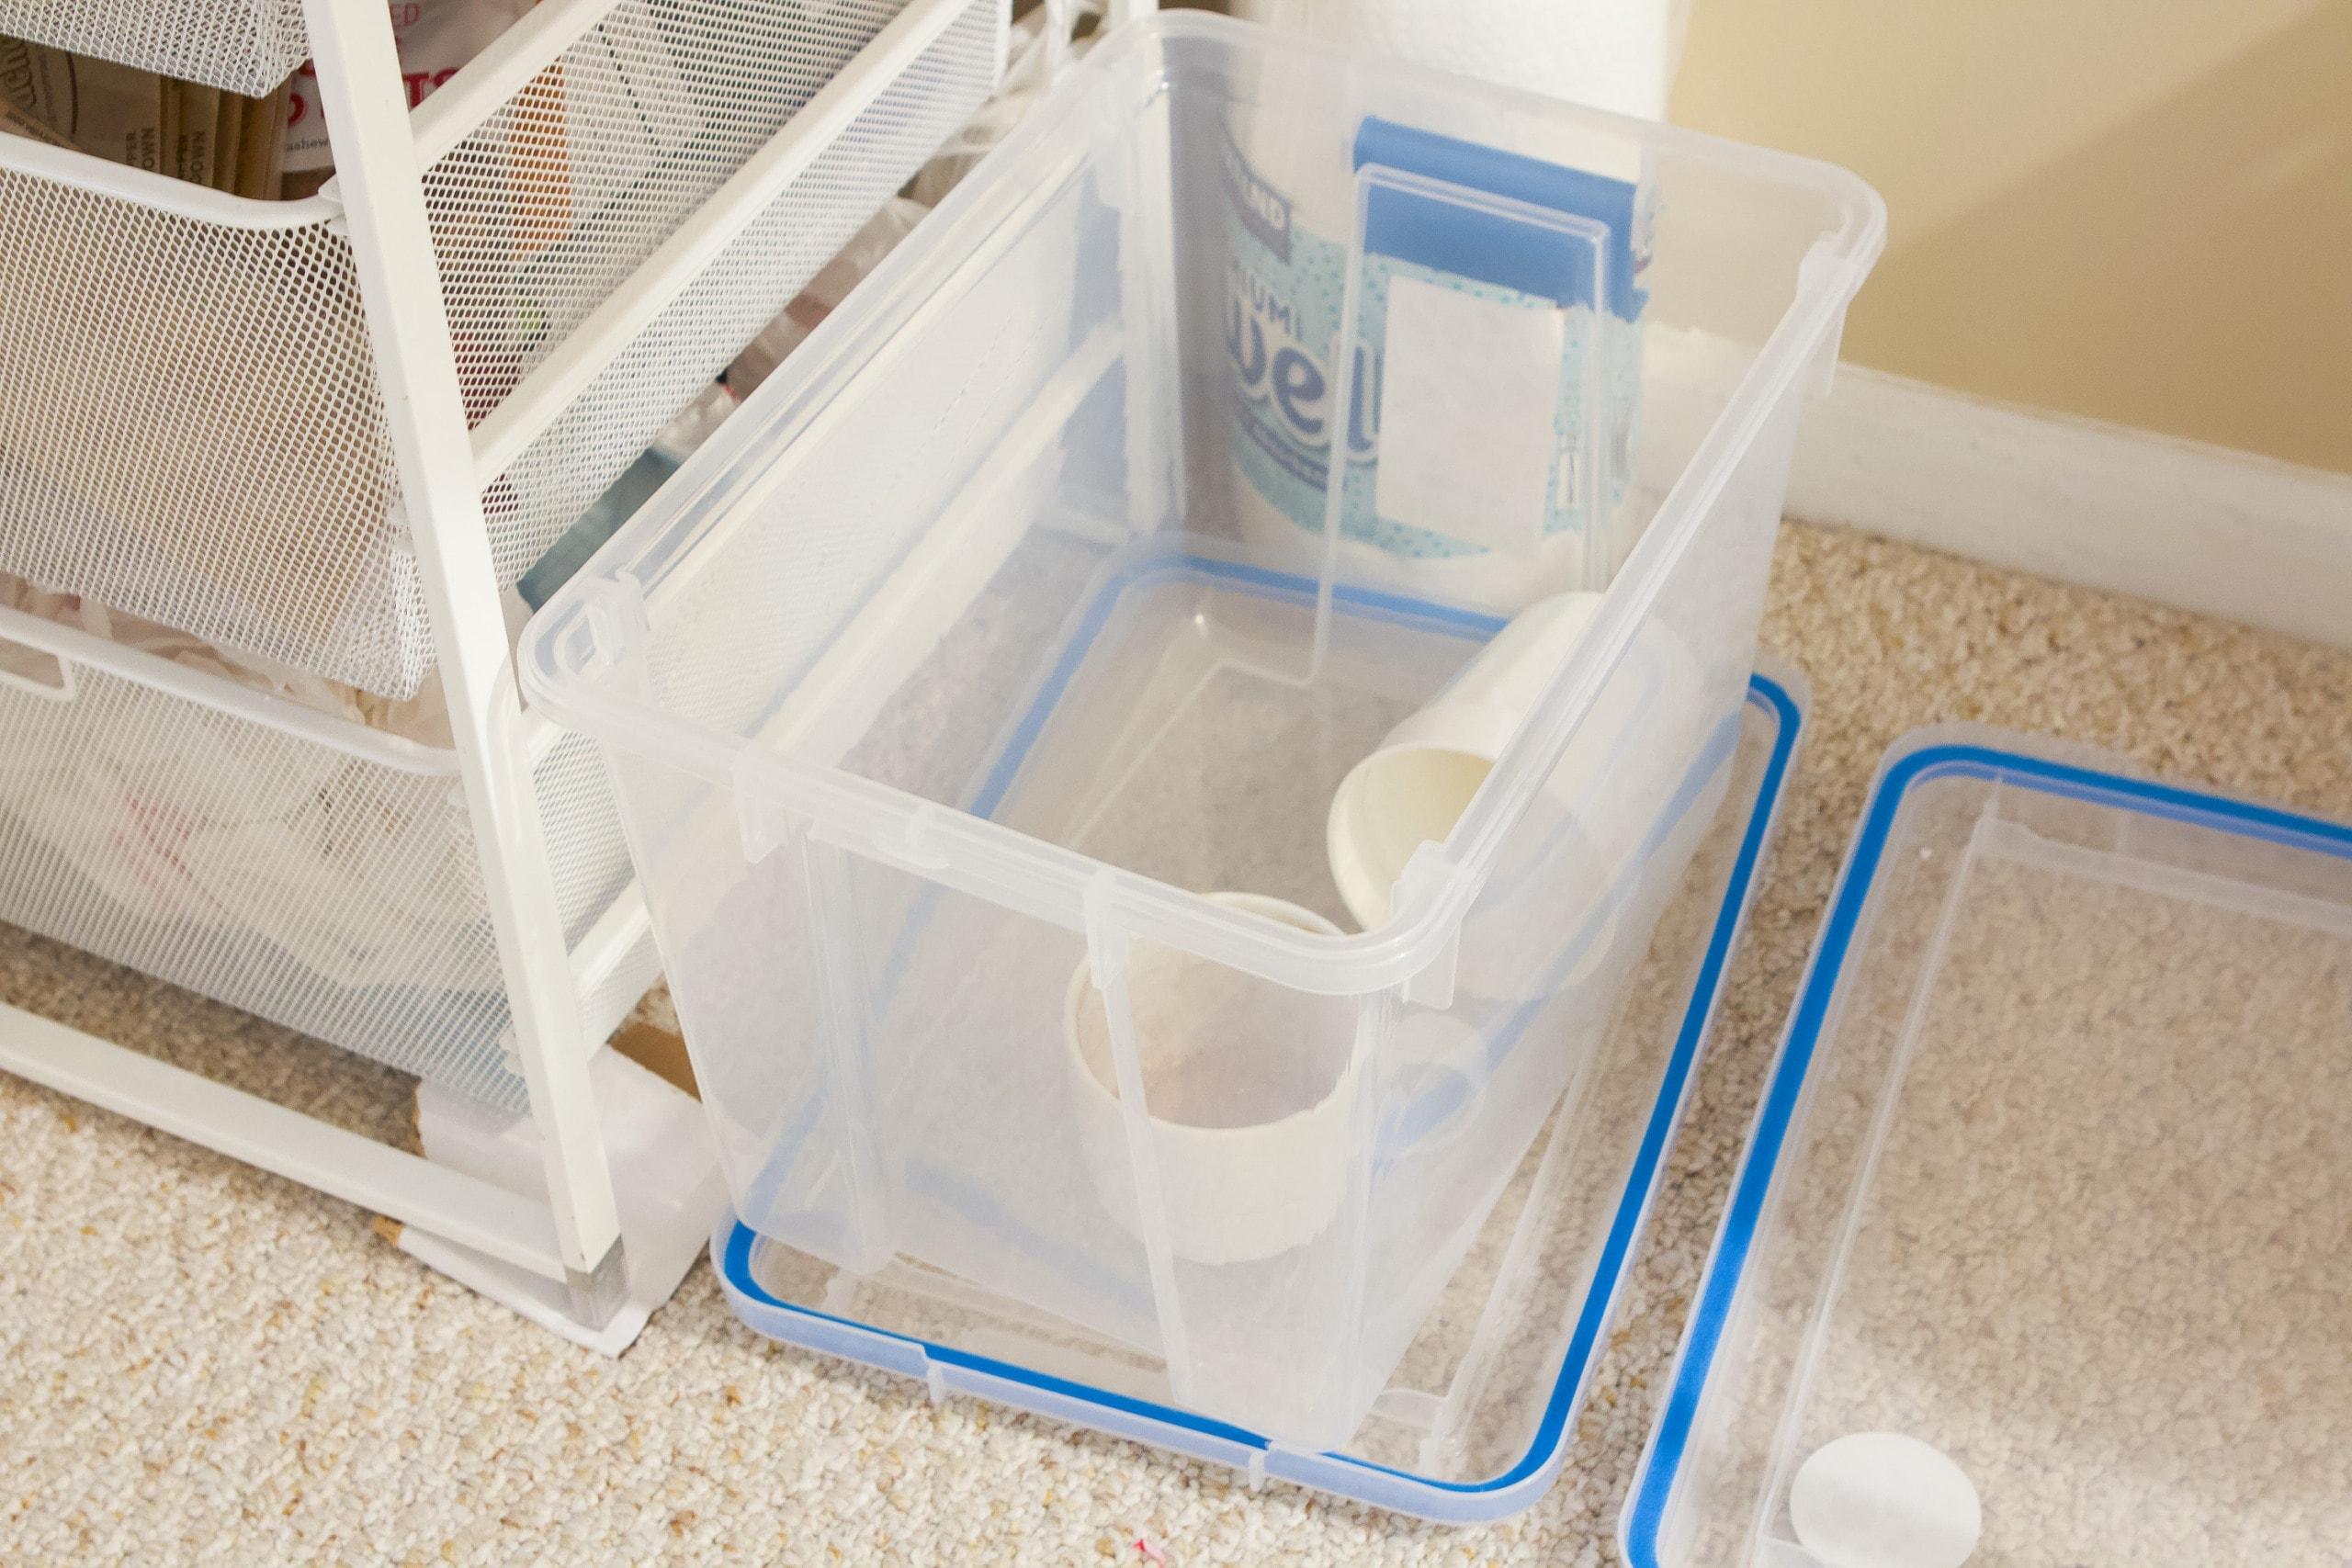 Dirty dish bin